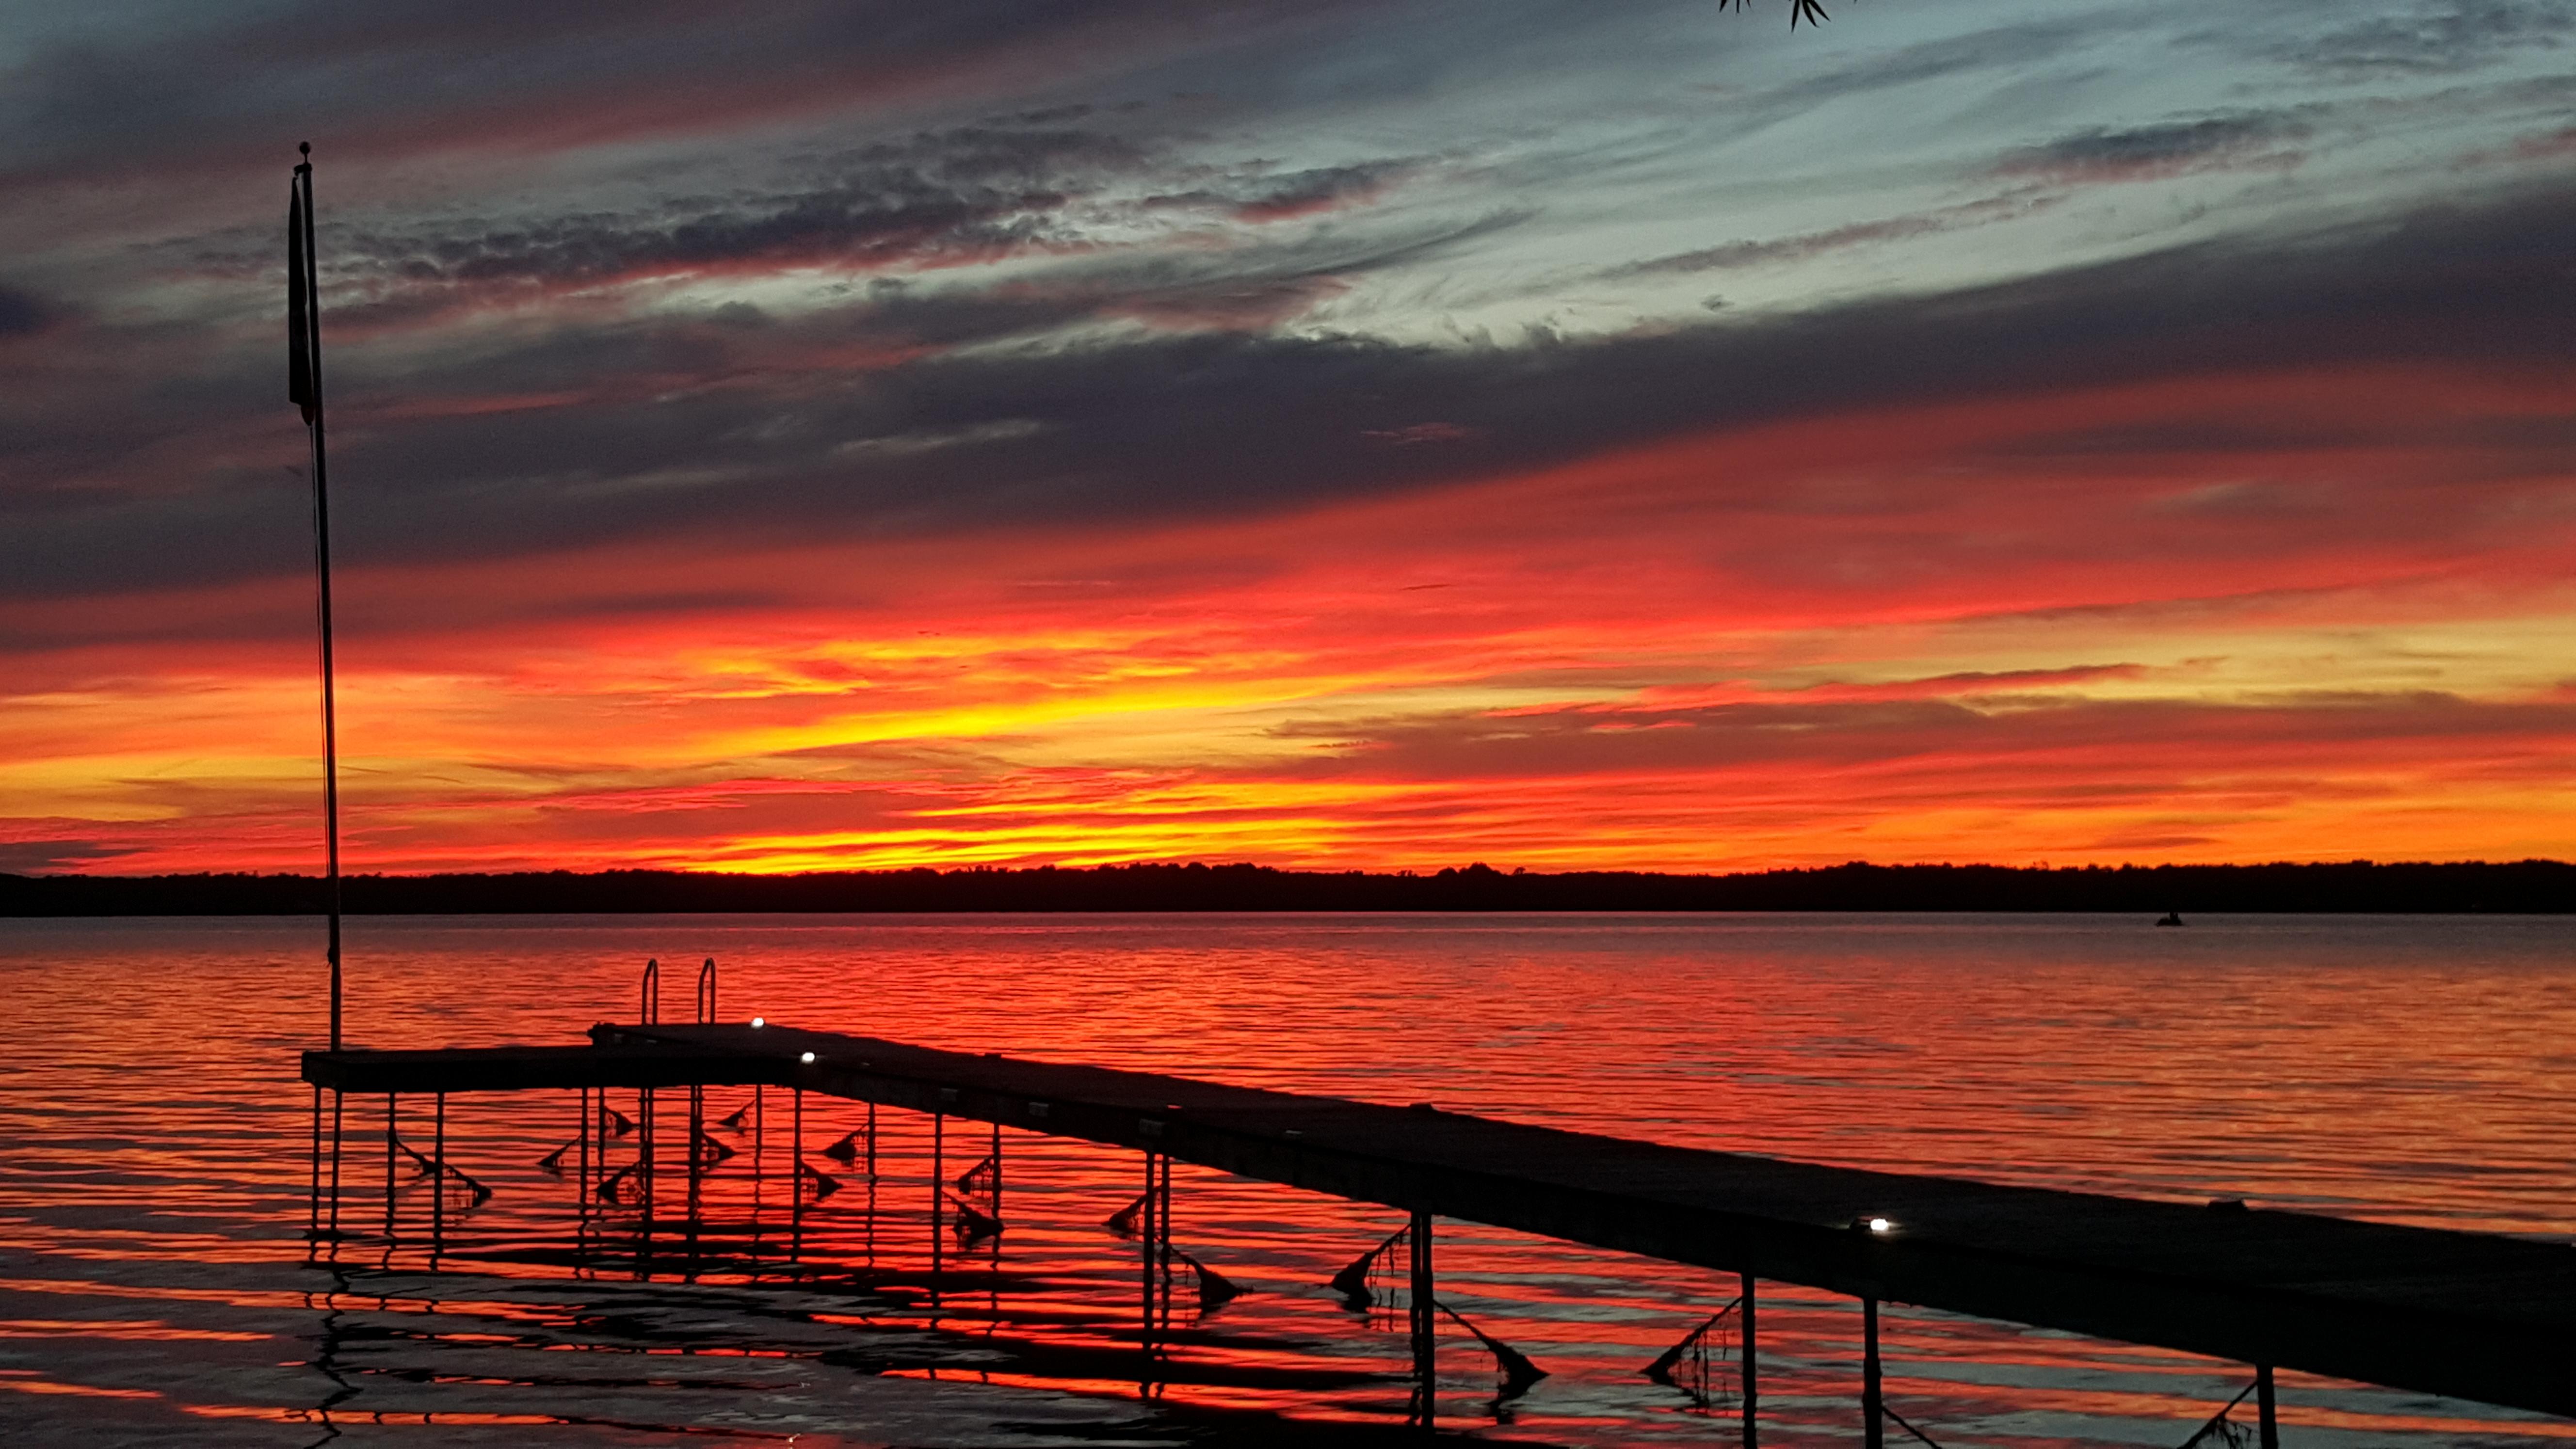 Sunset Aug 2016